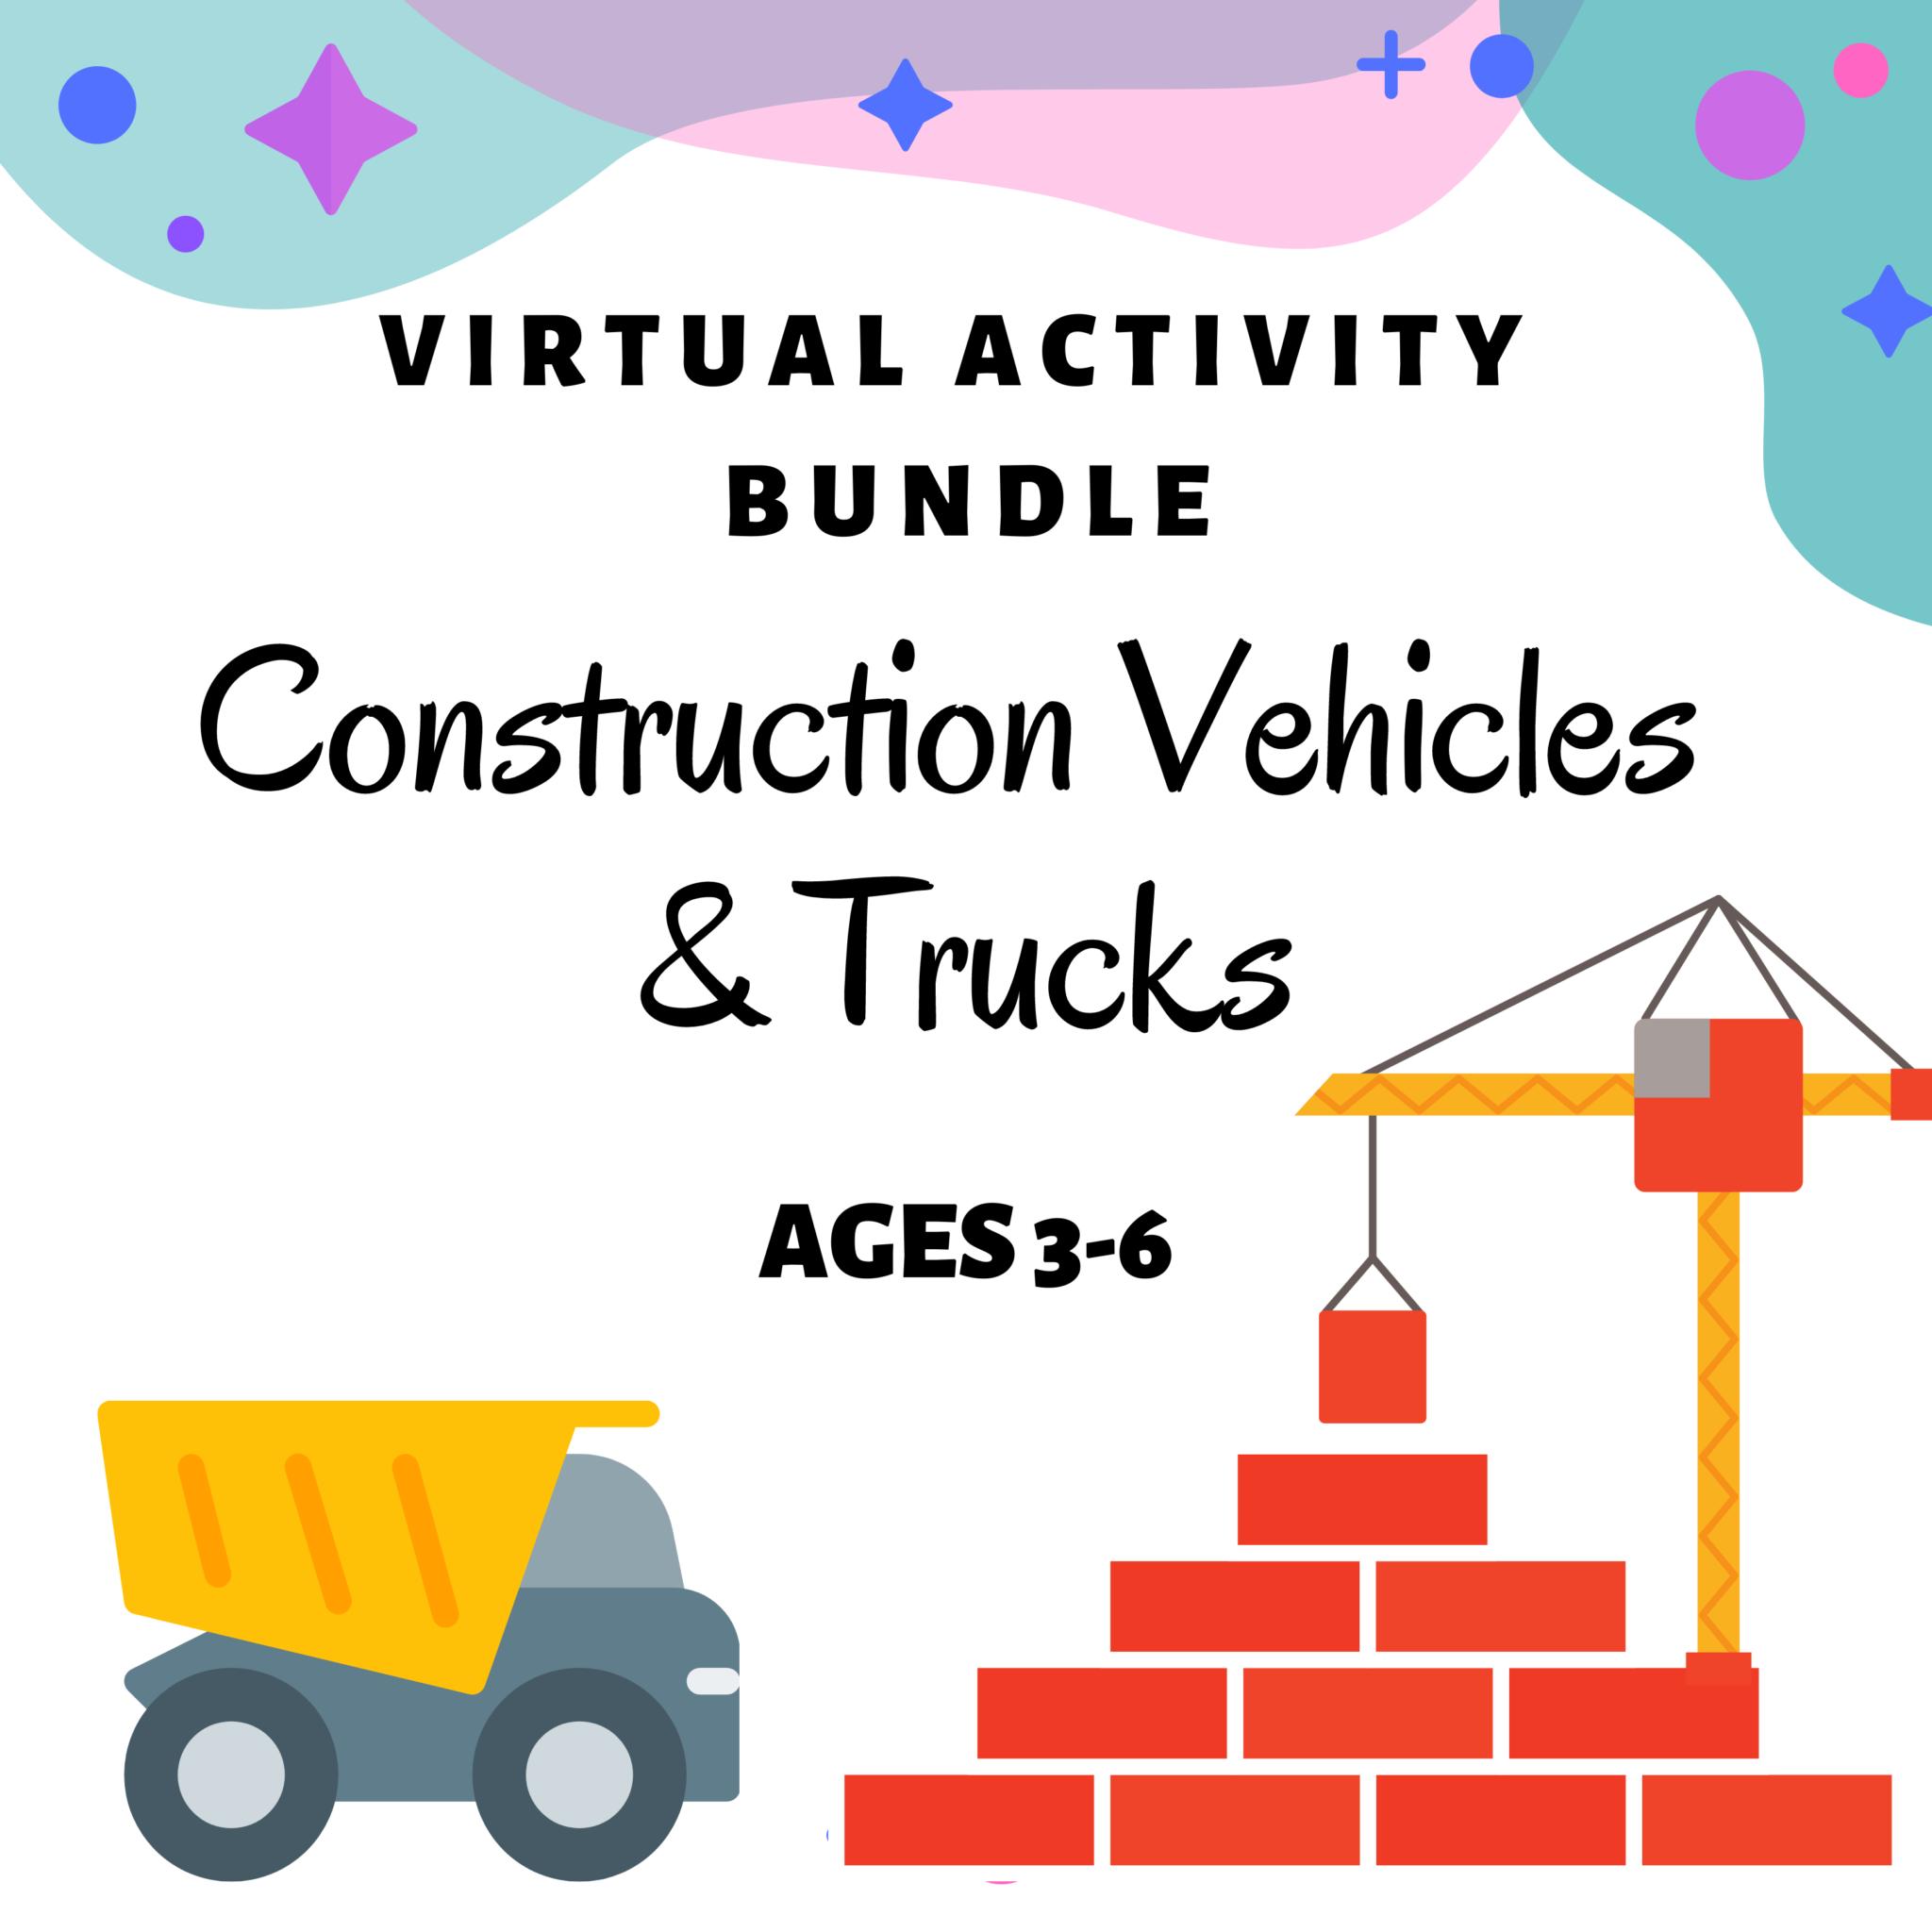 VAB Construction Vehicles & Trucks